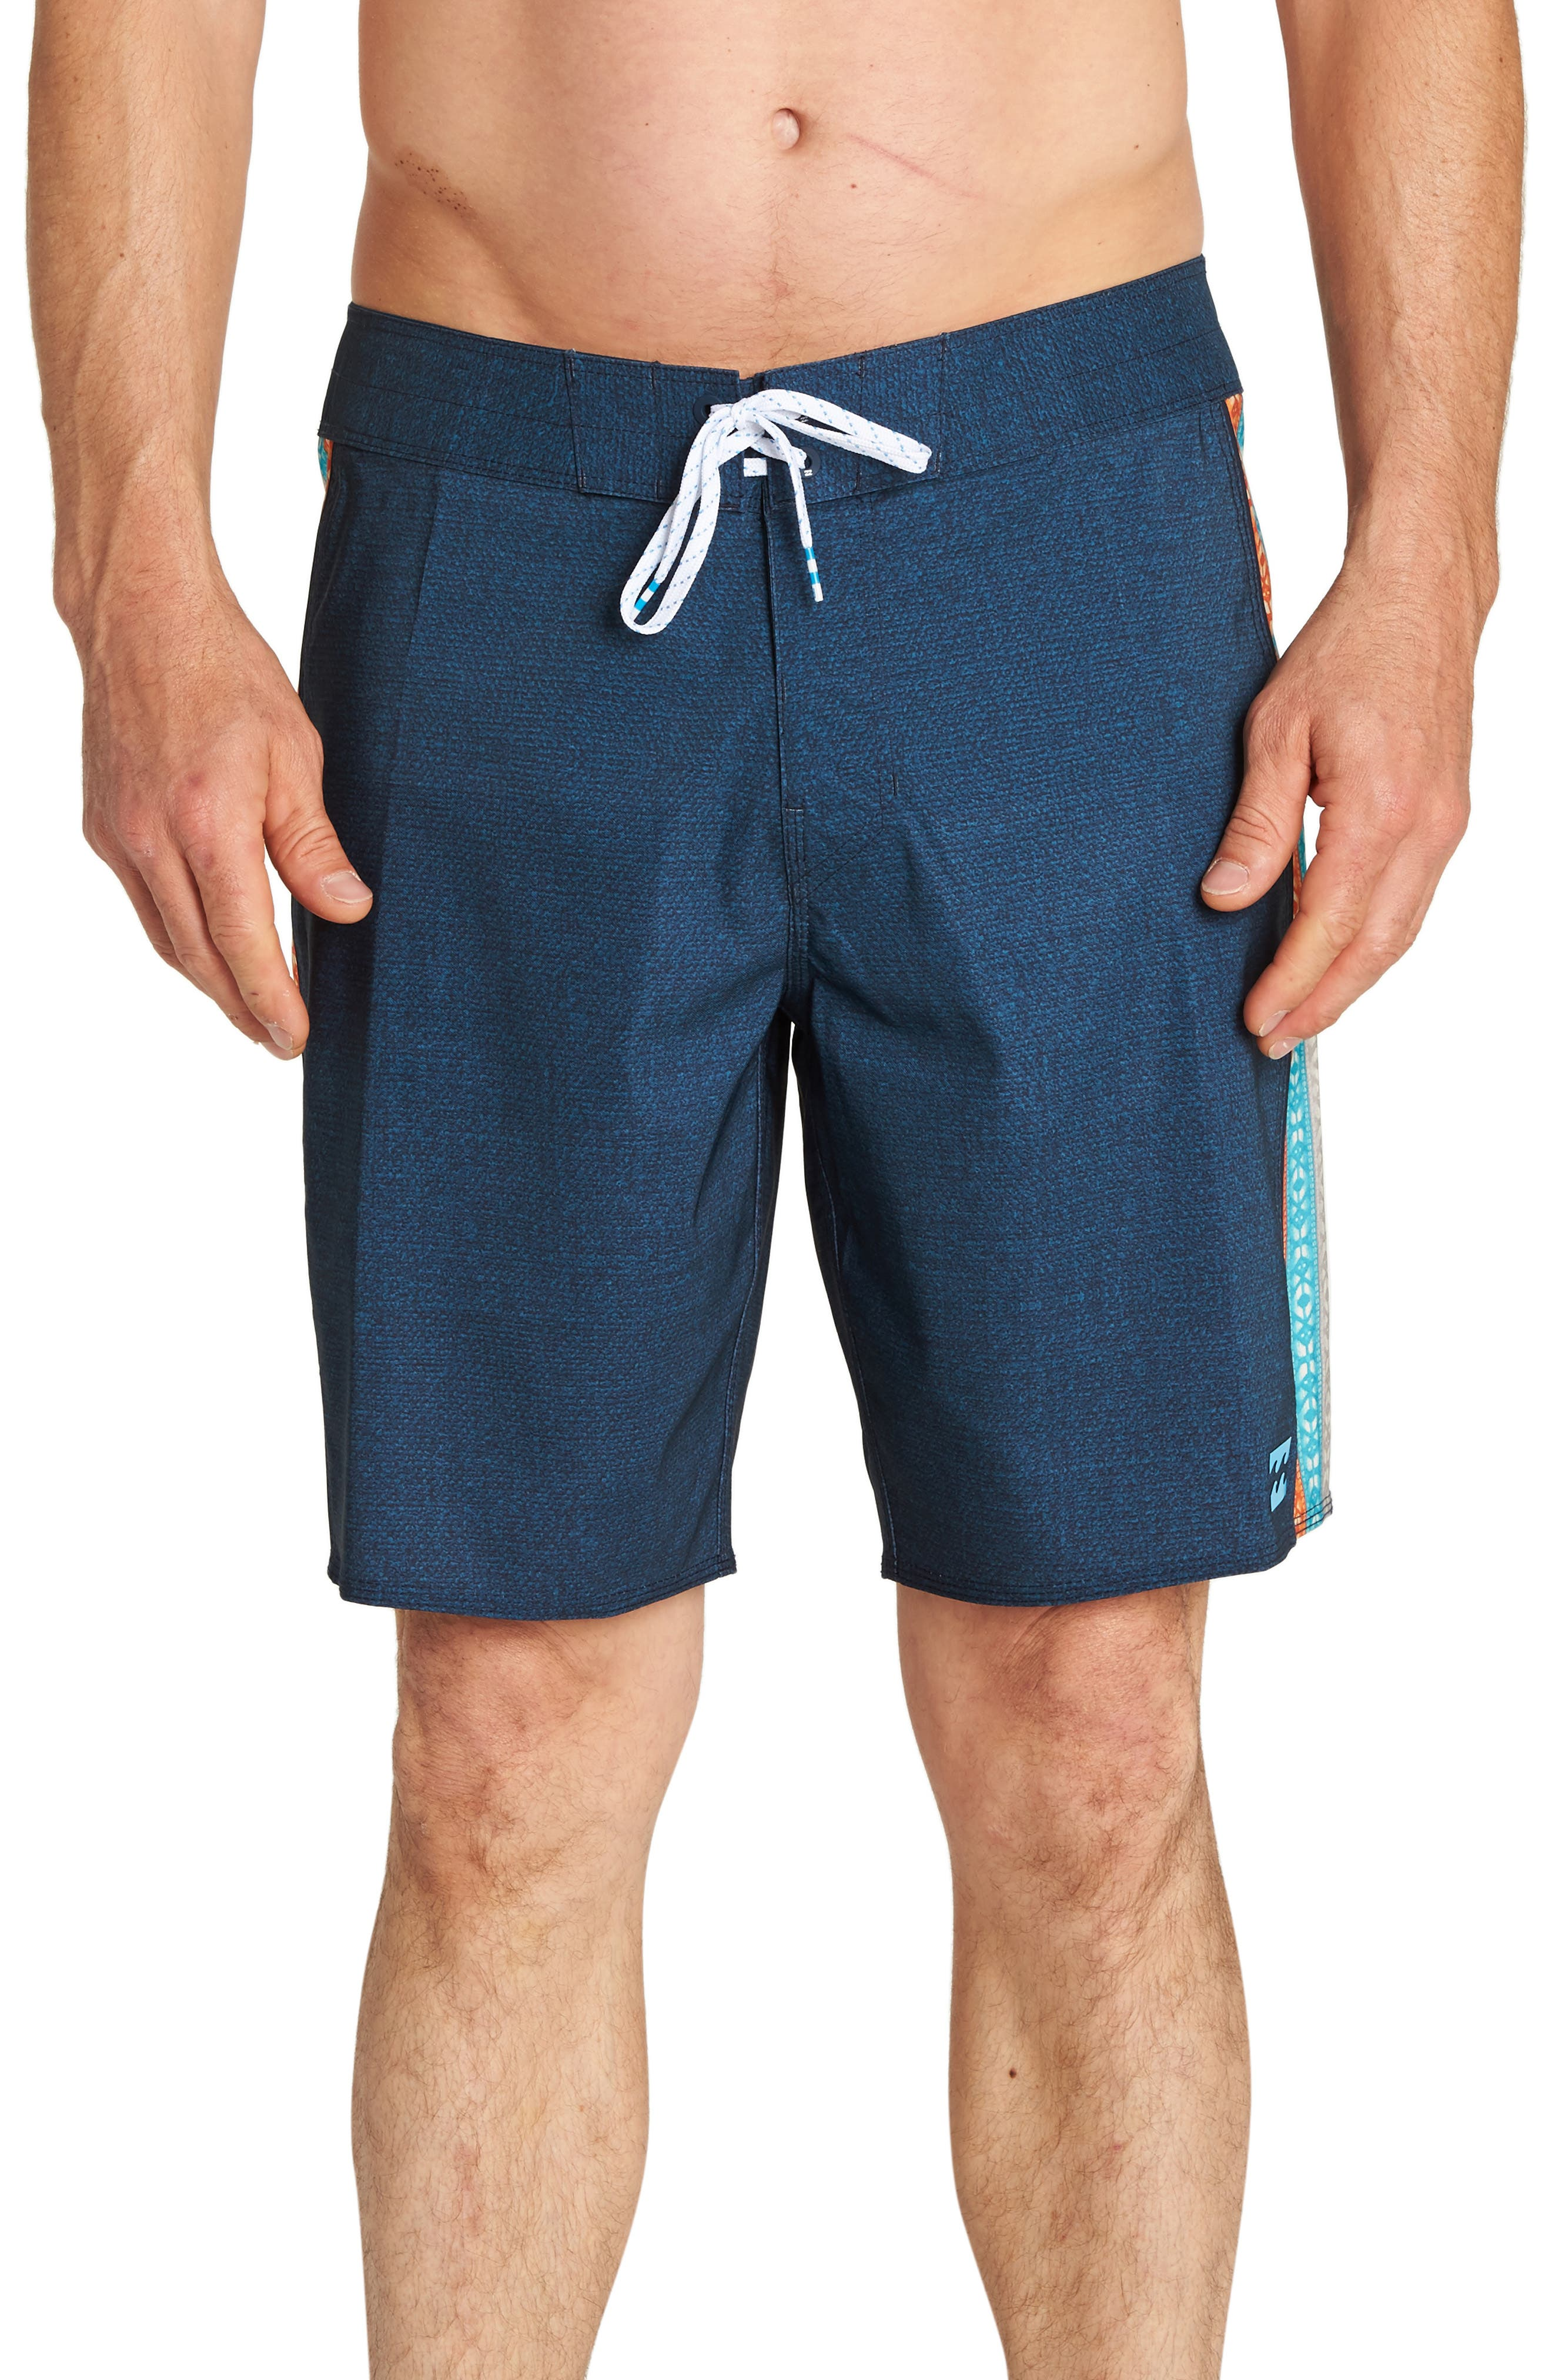 D Bah Airlite Board Shorts,                         Main,                         color, INDIGO